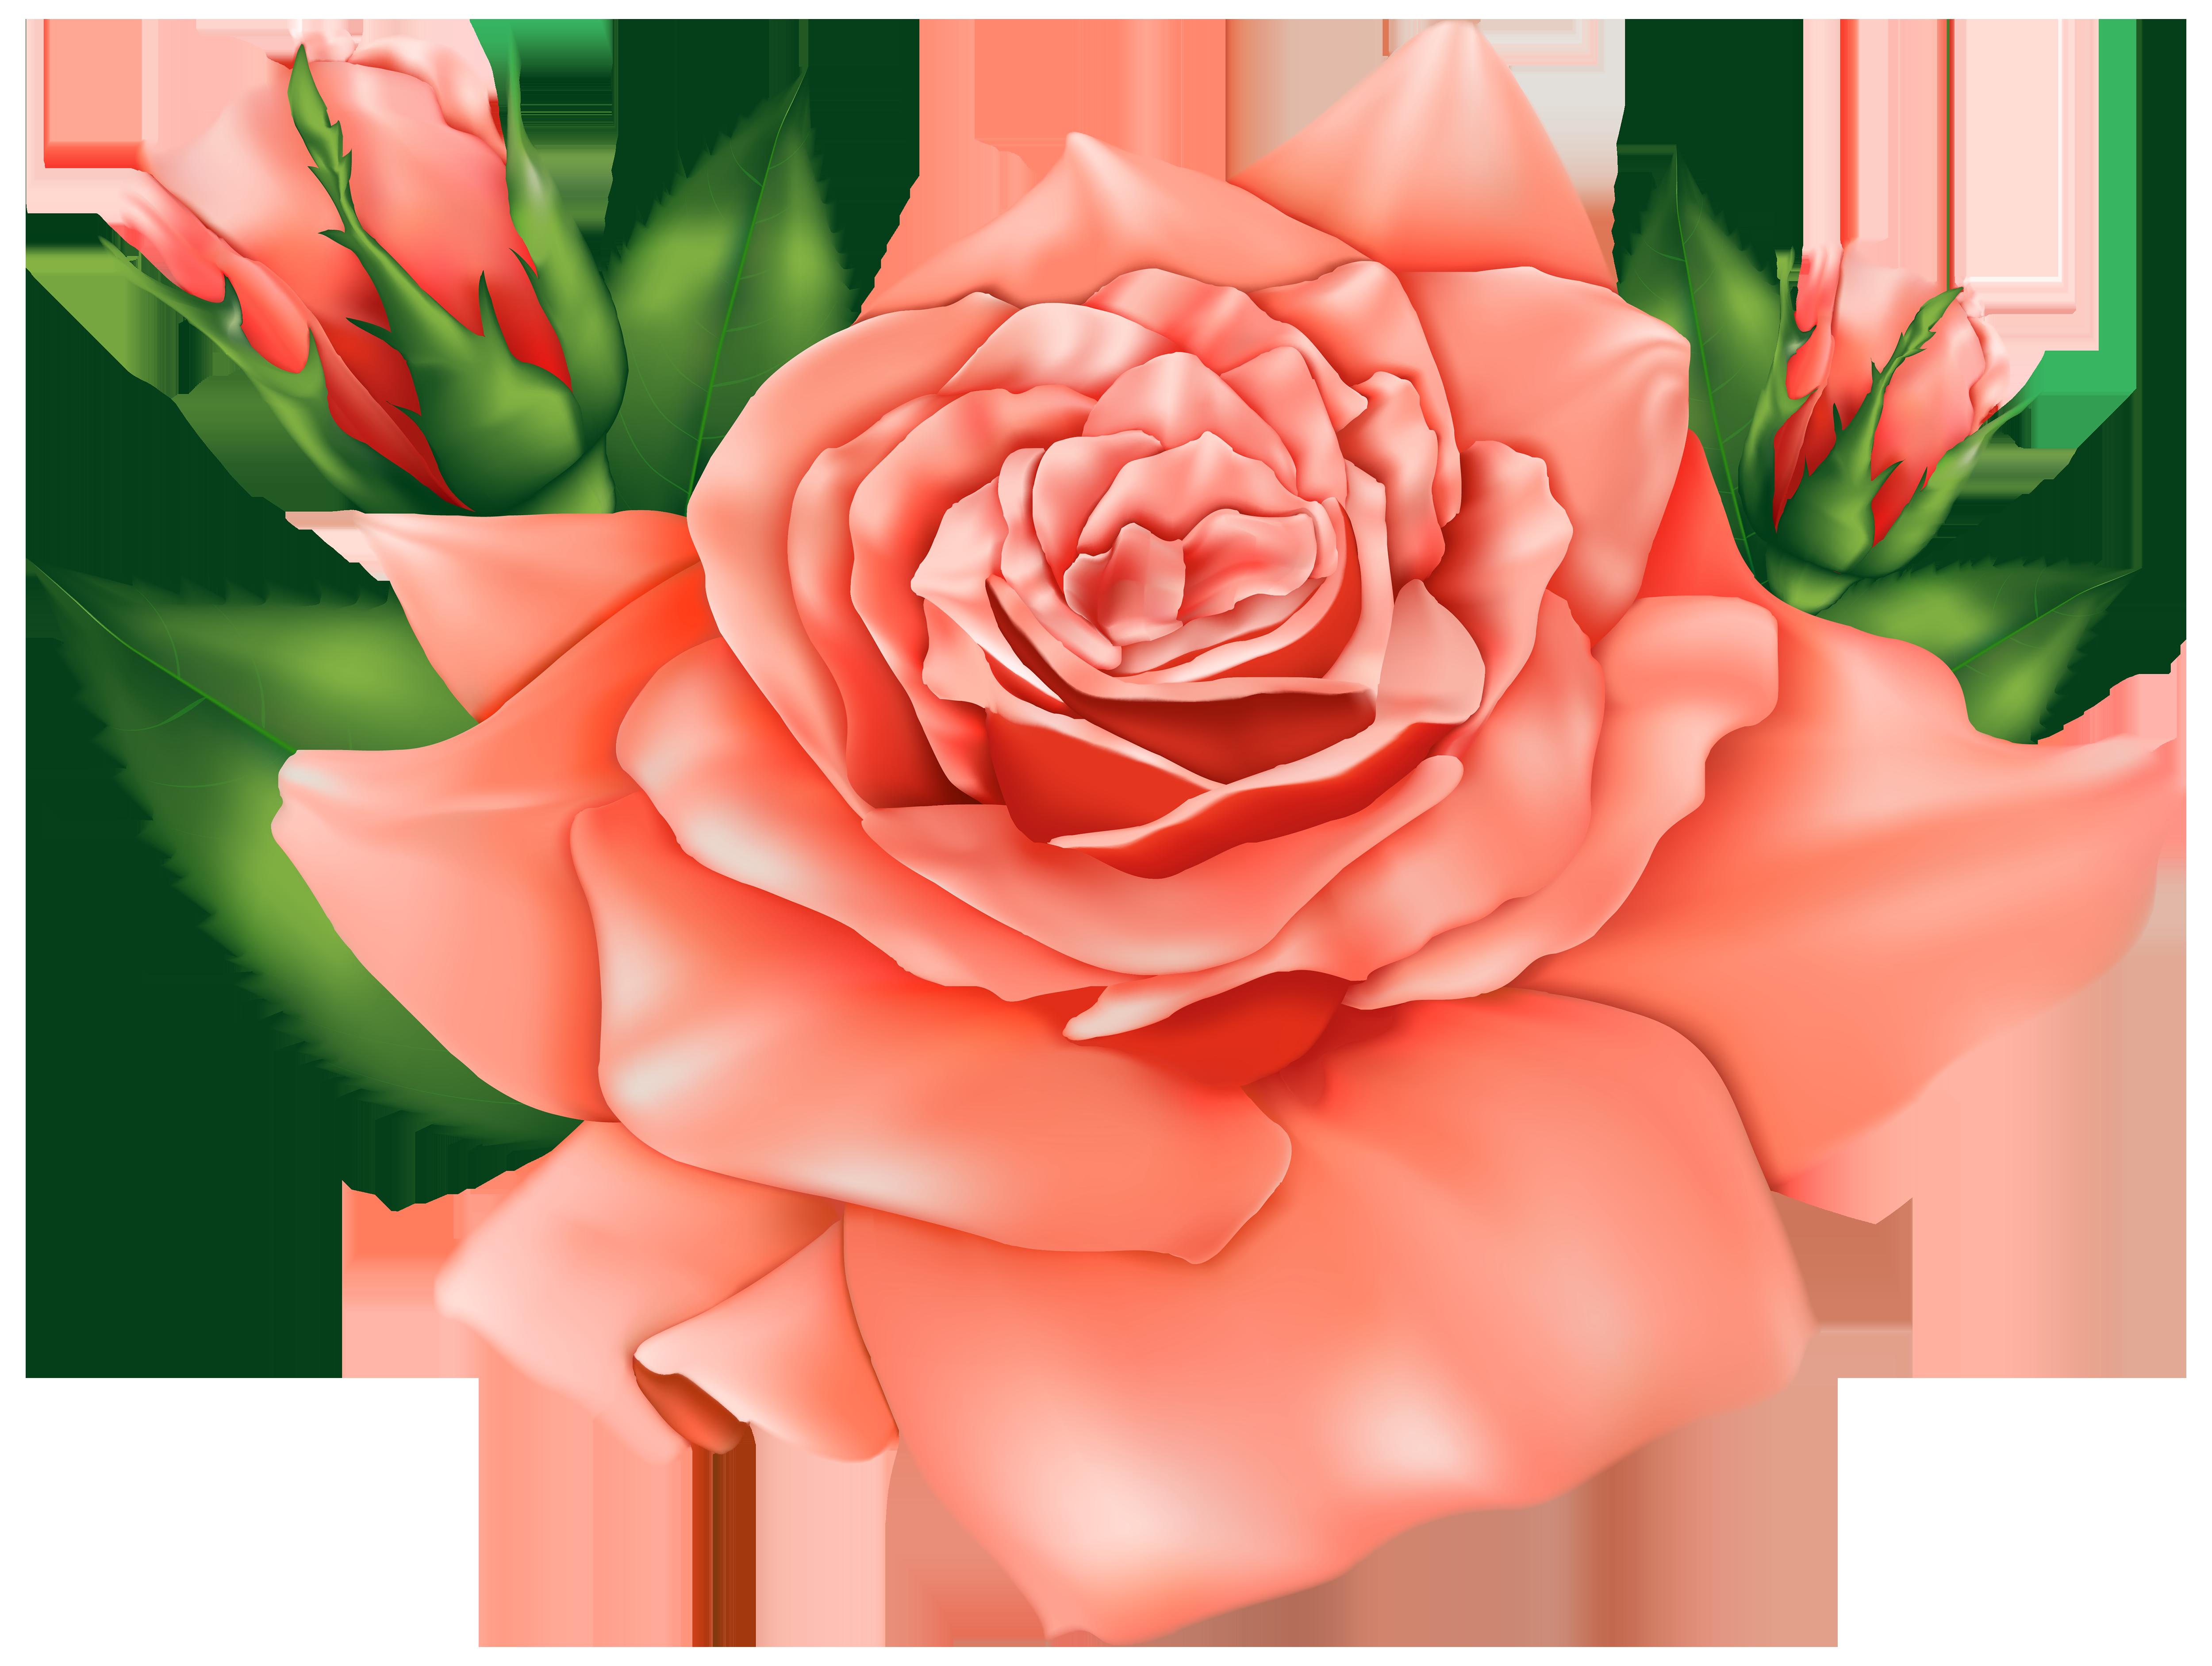 Orange roses png image. Rose clipart cross